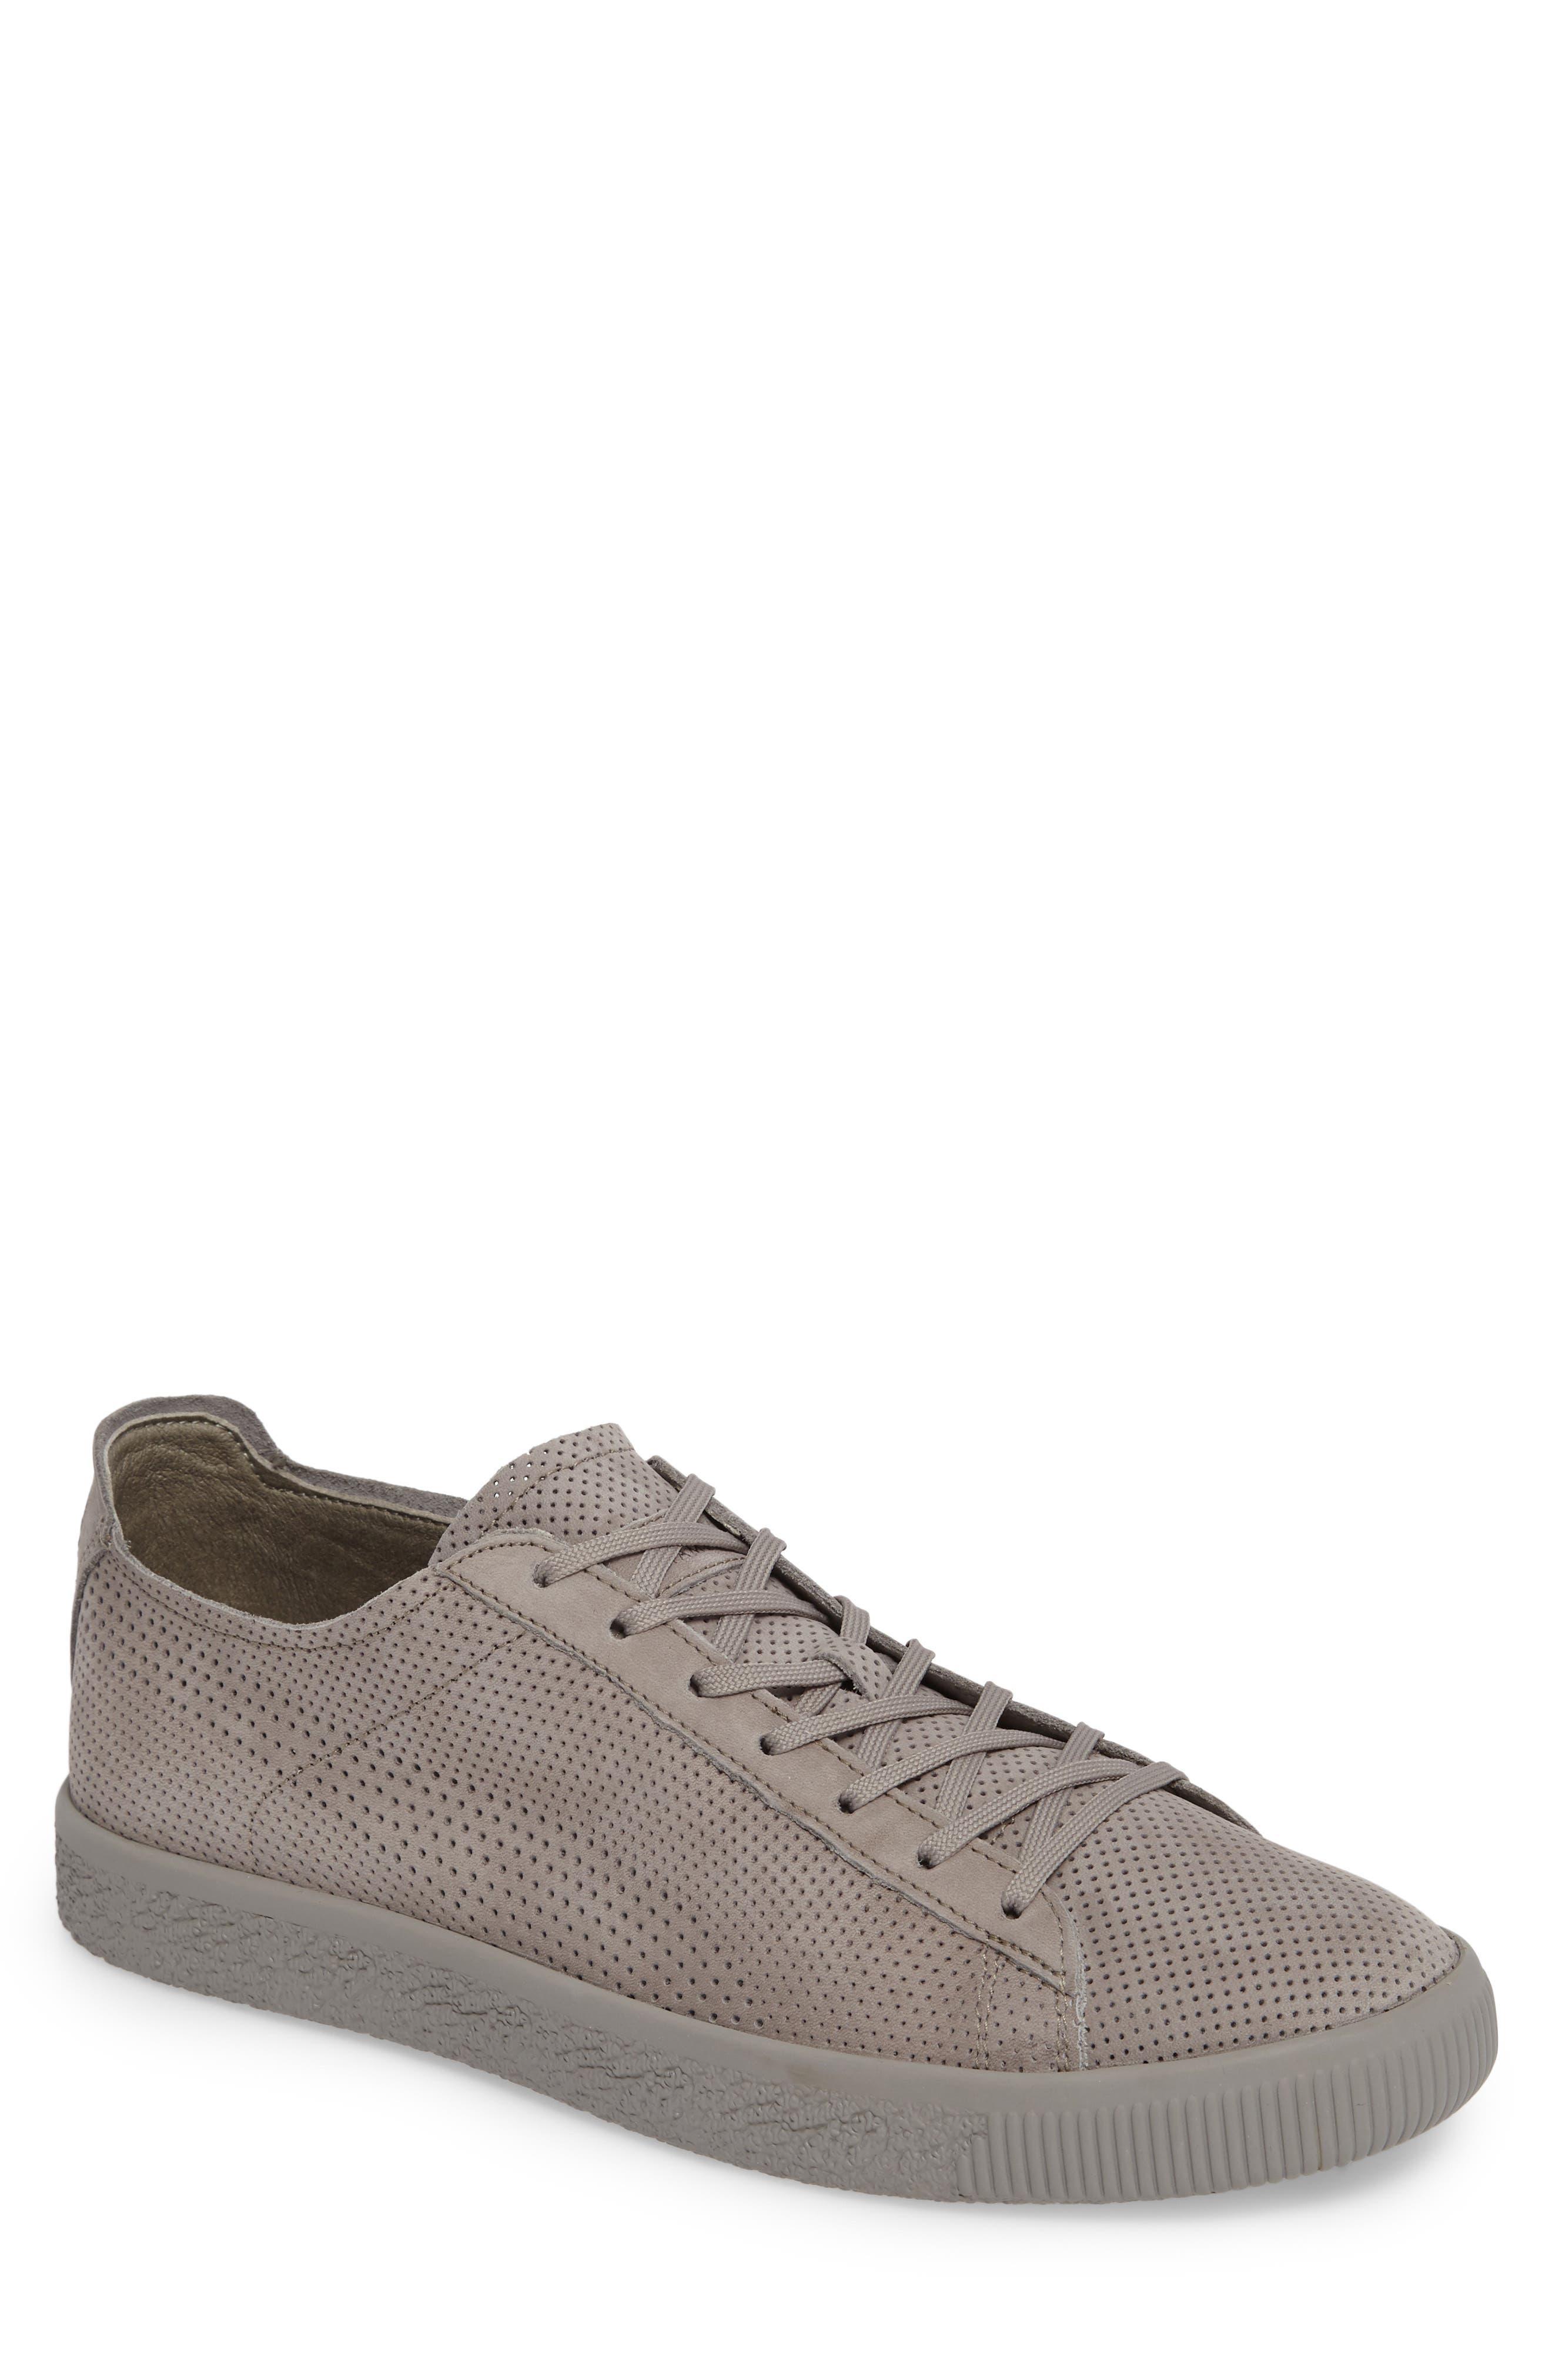 PUMA Stampd Clyde Sneaker (Men)